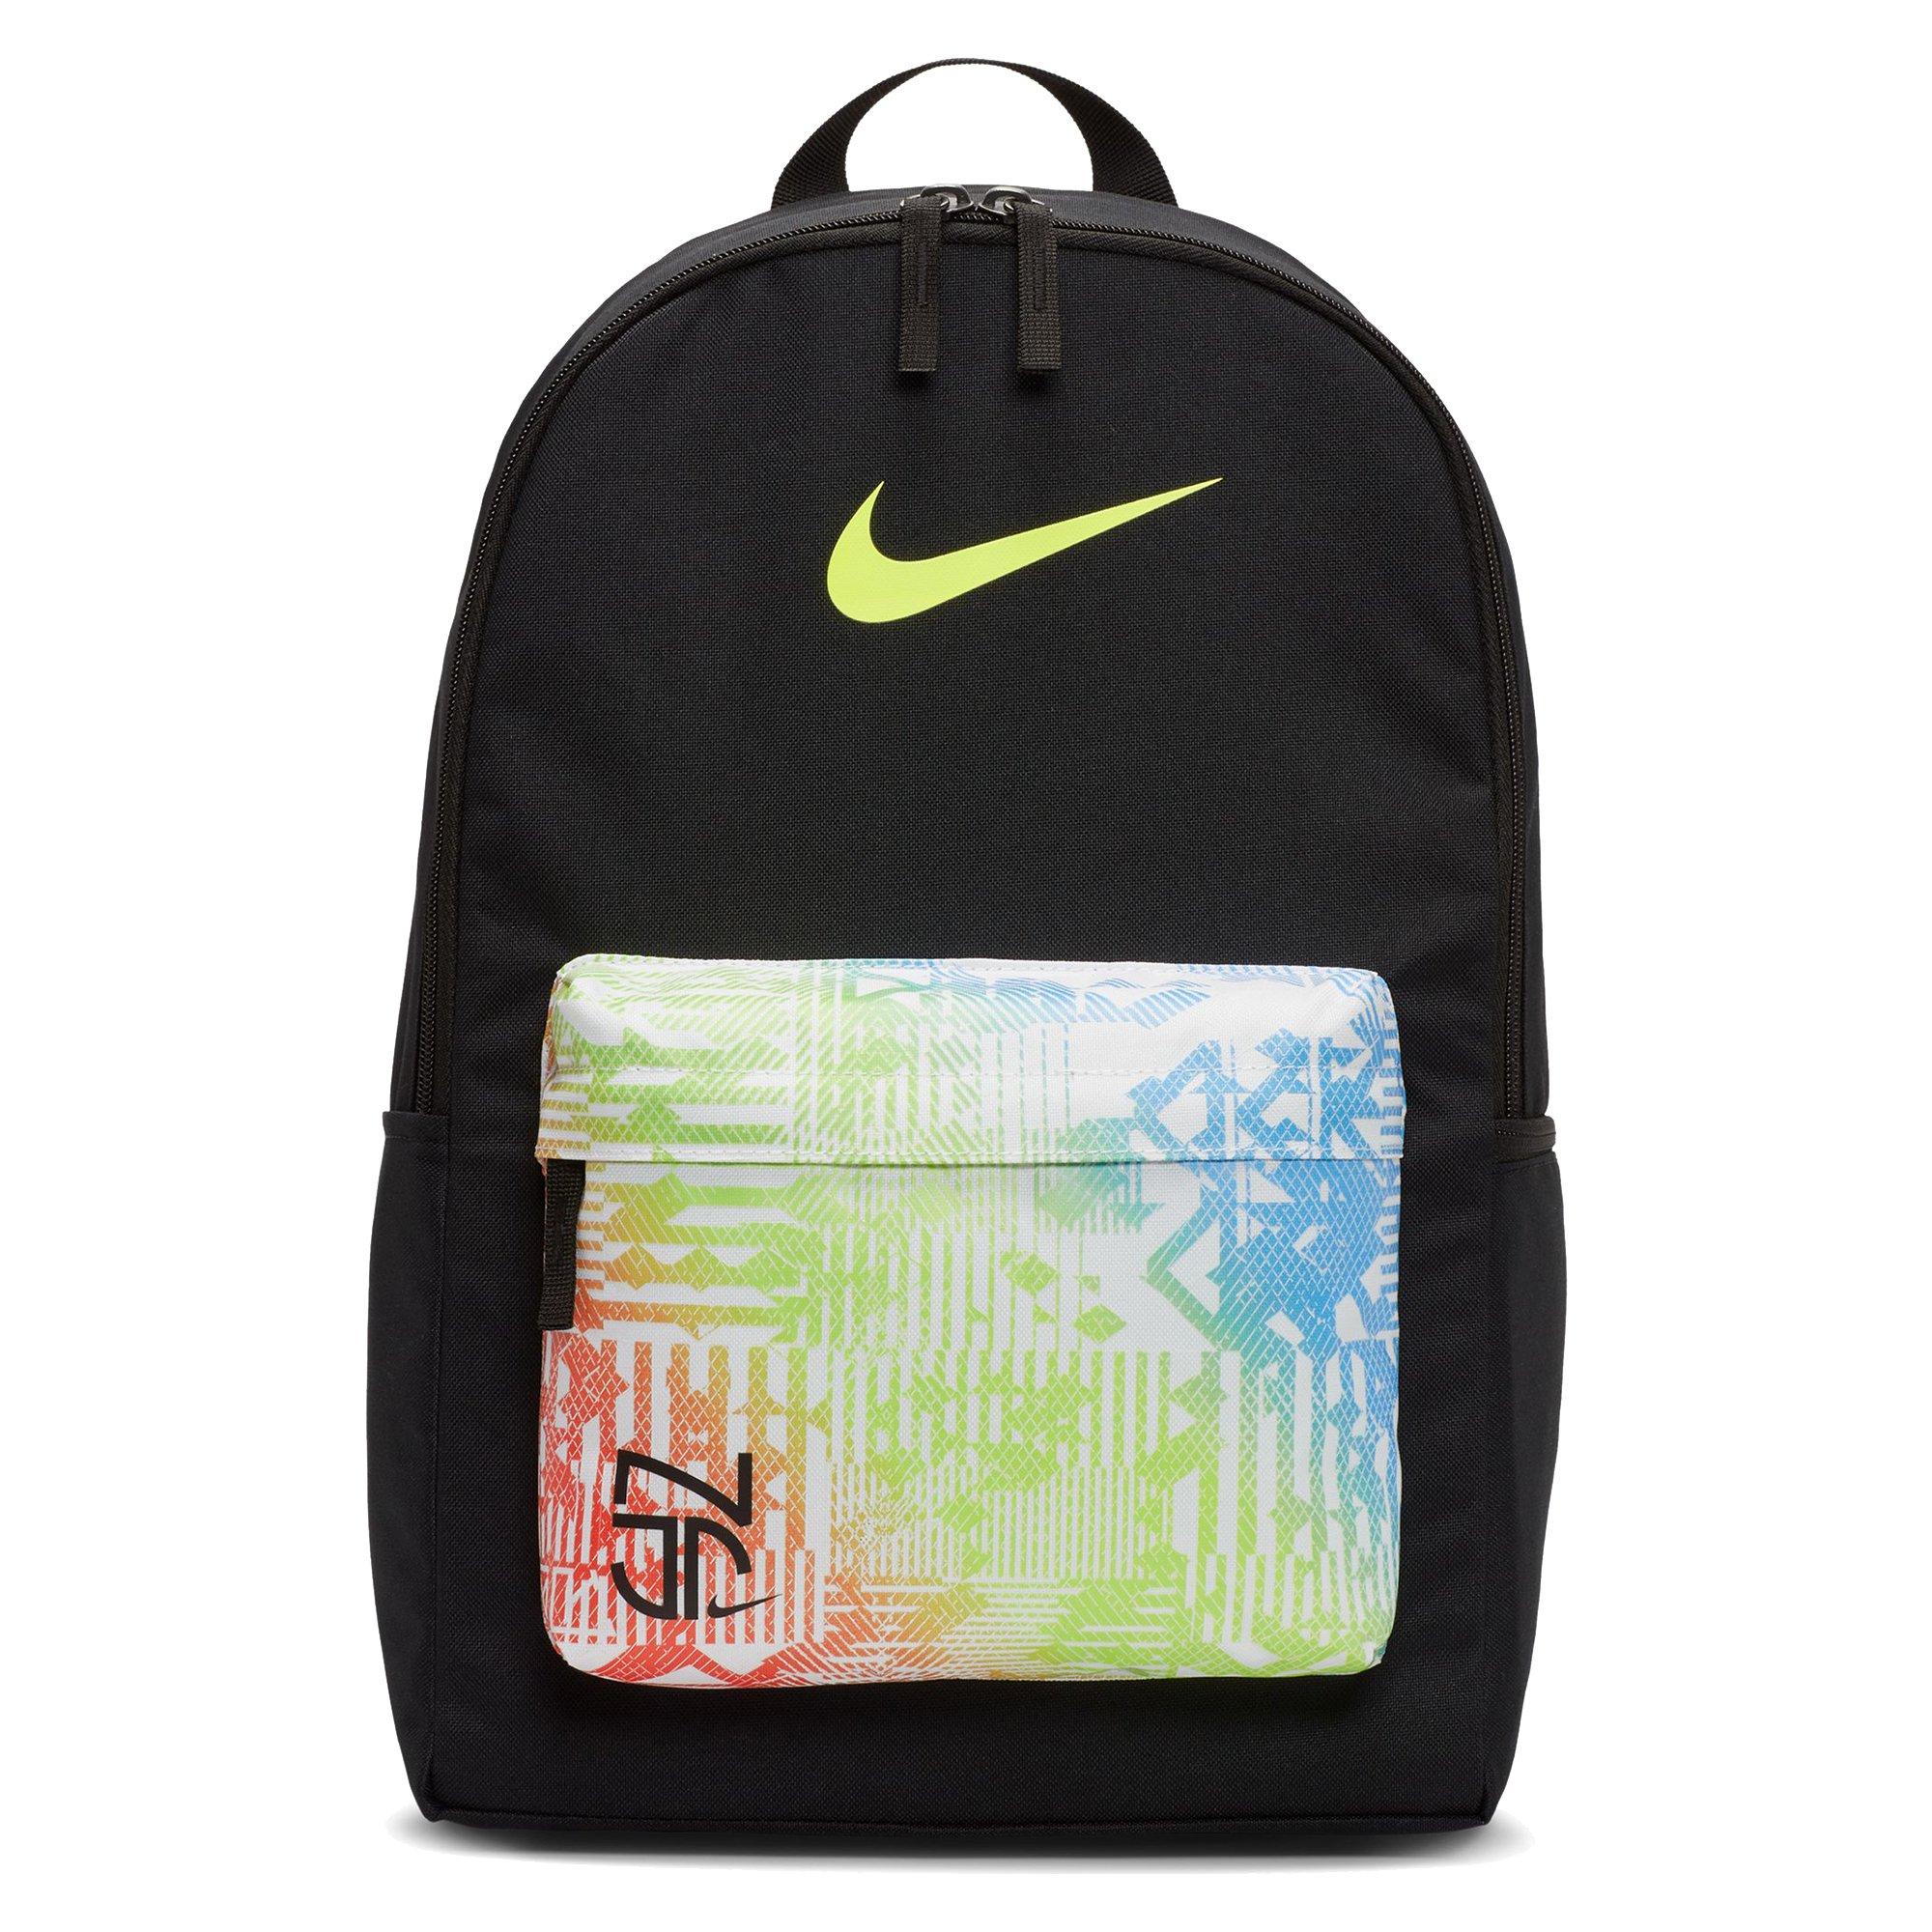 Nike Neymar Jr Backpack Mini Boy Cocuk Sirt Cantasi Cn6969 010 Barcin